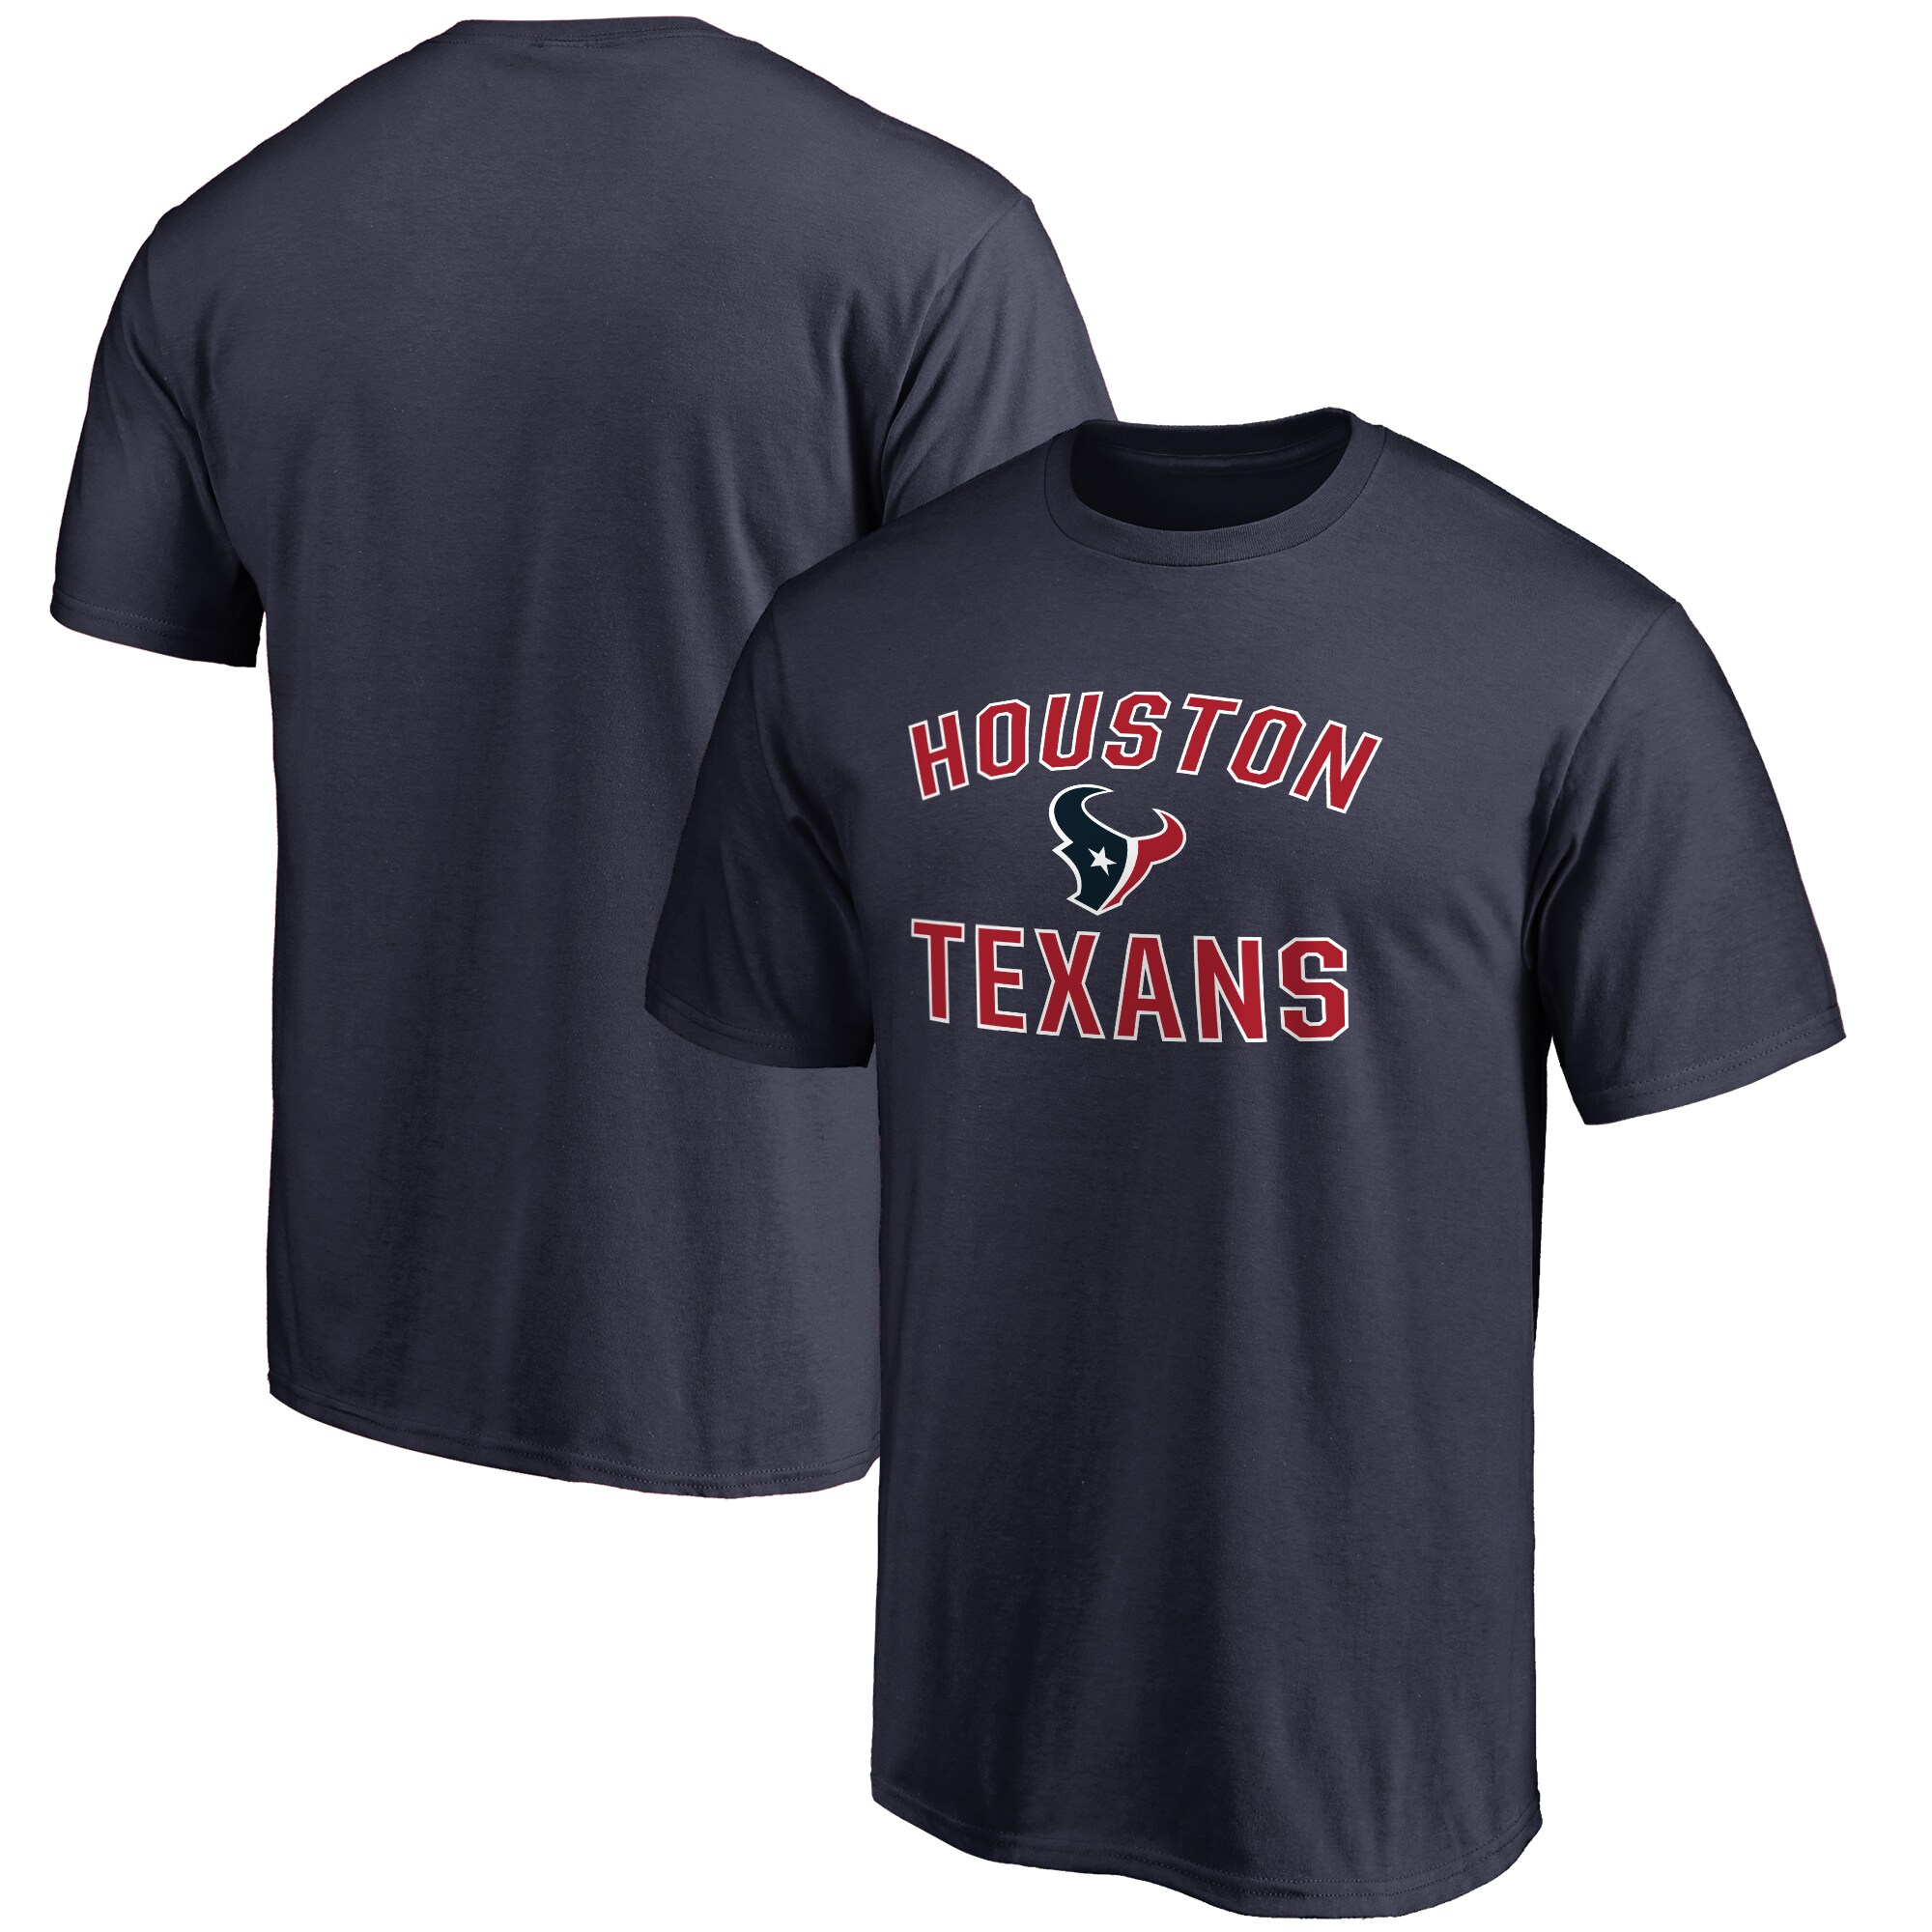 Houston Texans NFL Pro Line Big & Tall Victory Arch T-Shirt - Navy